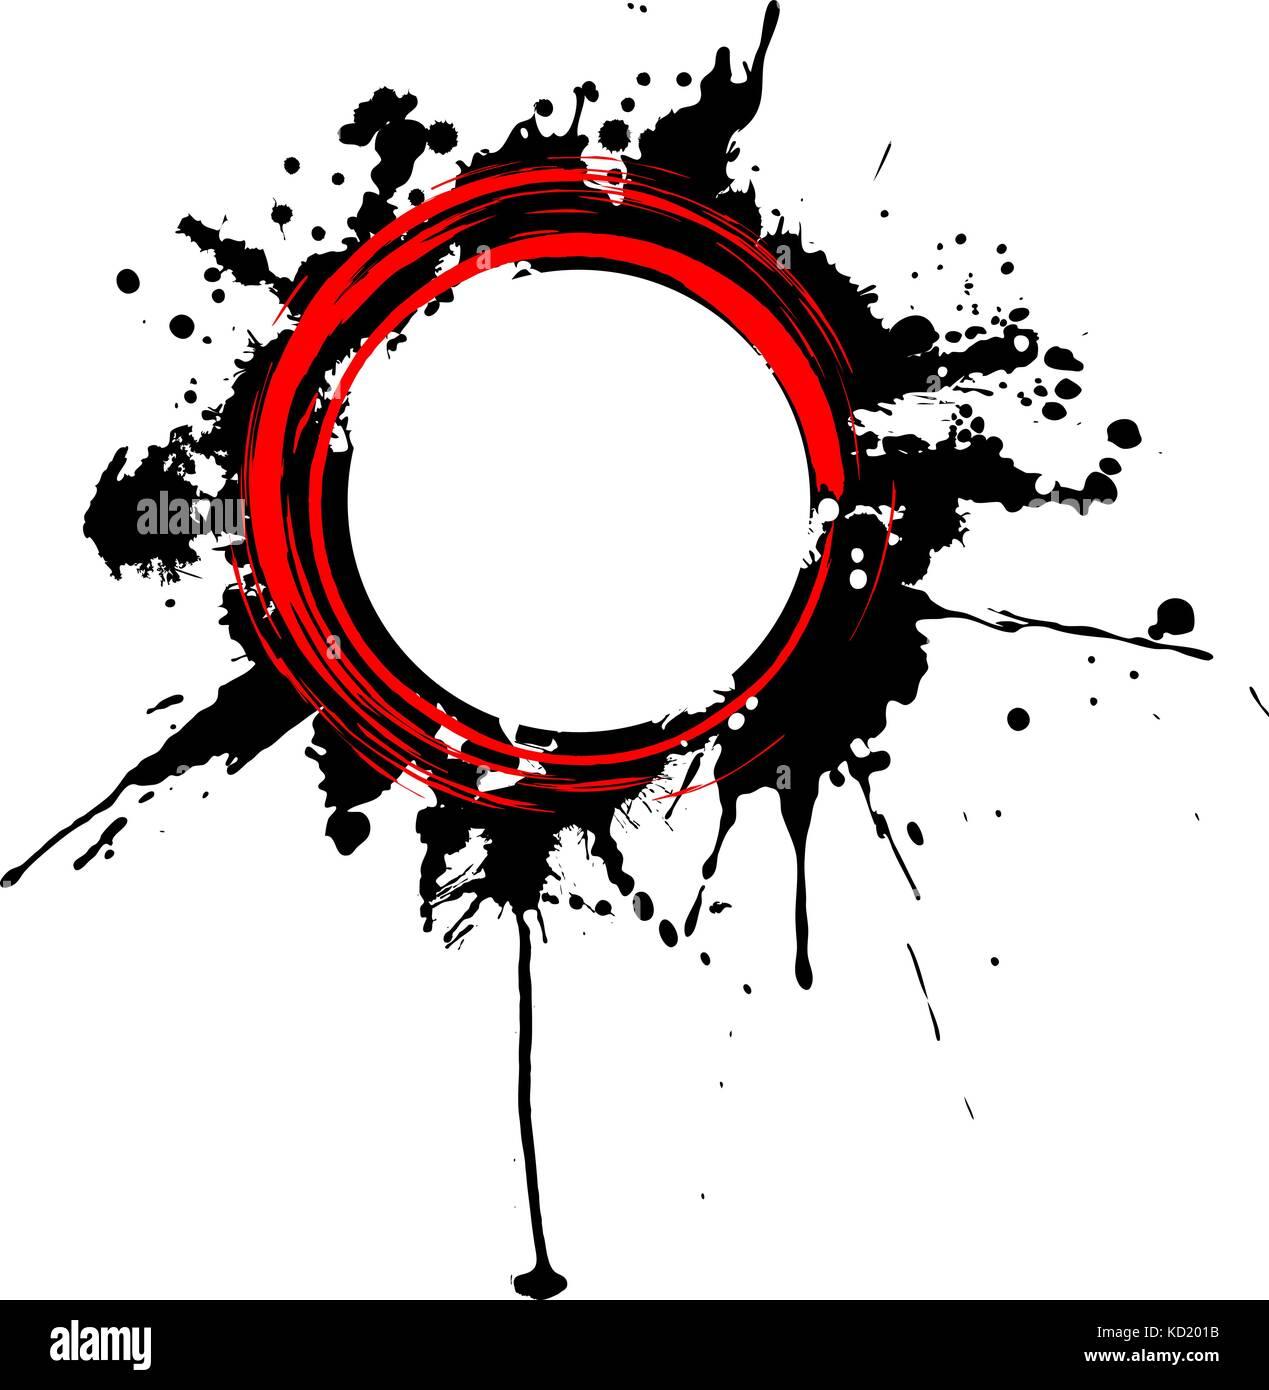 circular grunge banner stock vector art illustration vector image